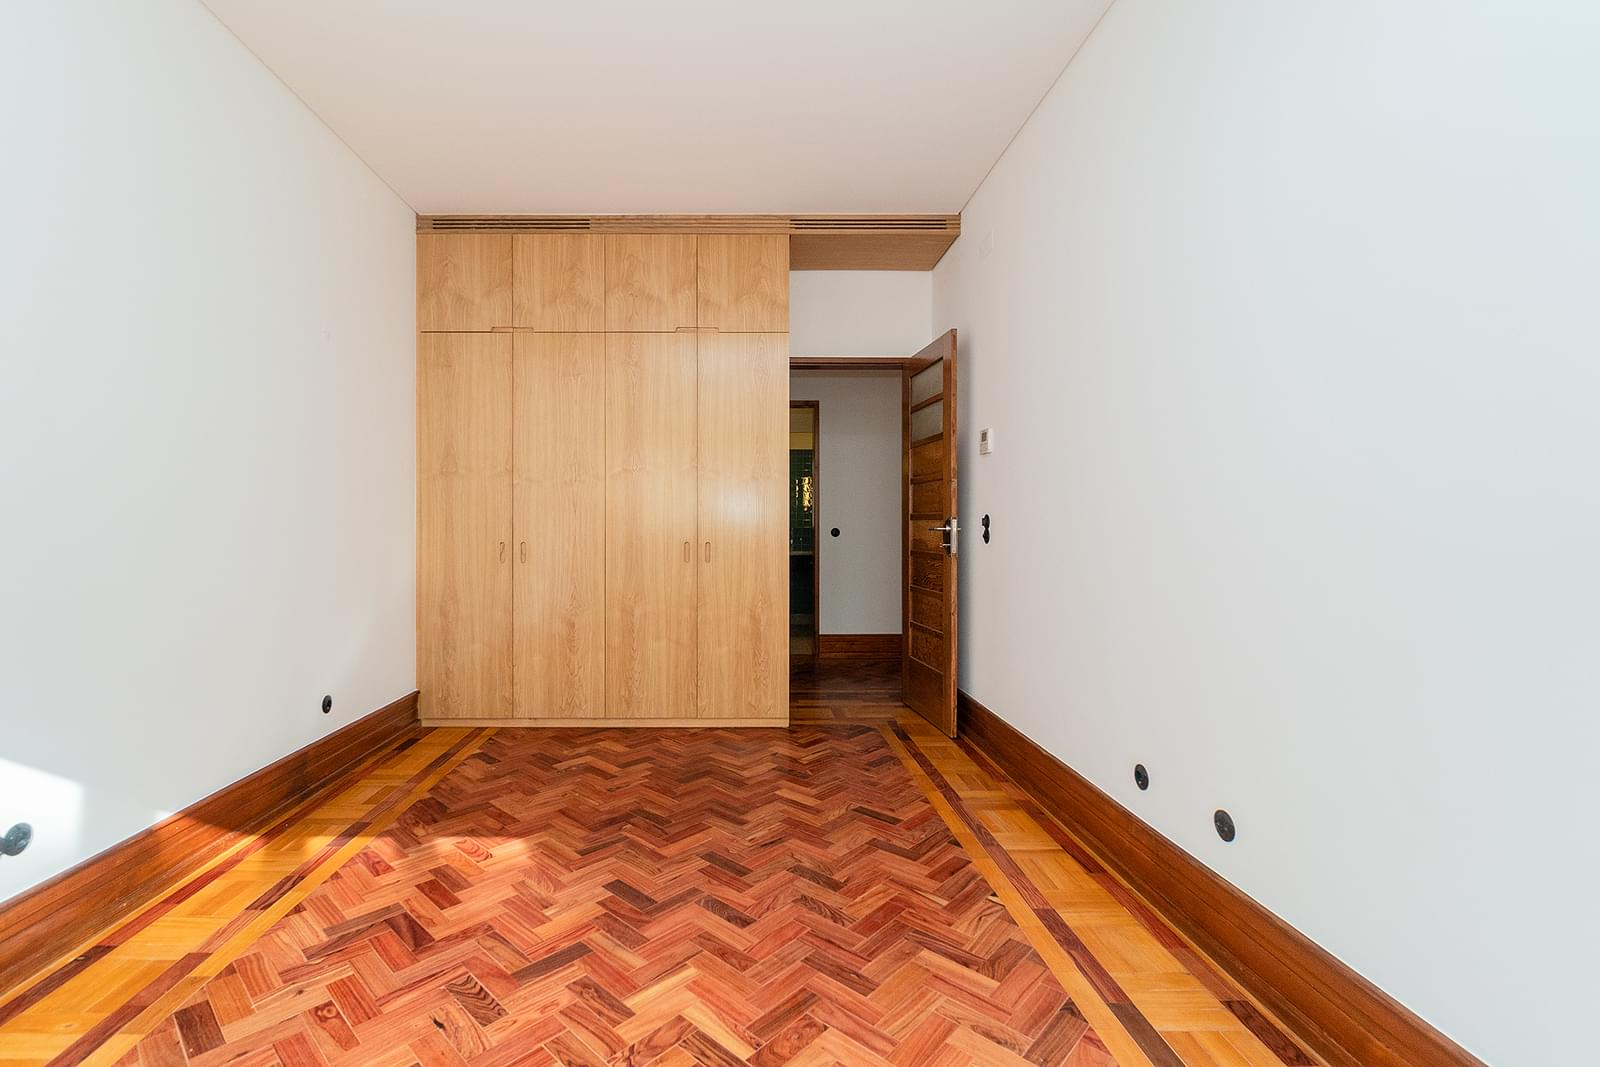 pf18665-apartamento-t3-2-lisboa-77744dfe-339f-4e7b-9557-25fb64bfdbf6